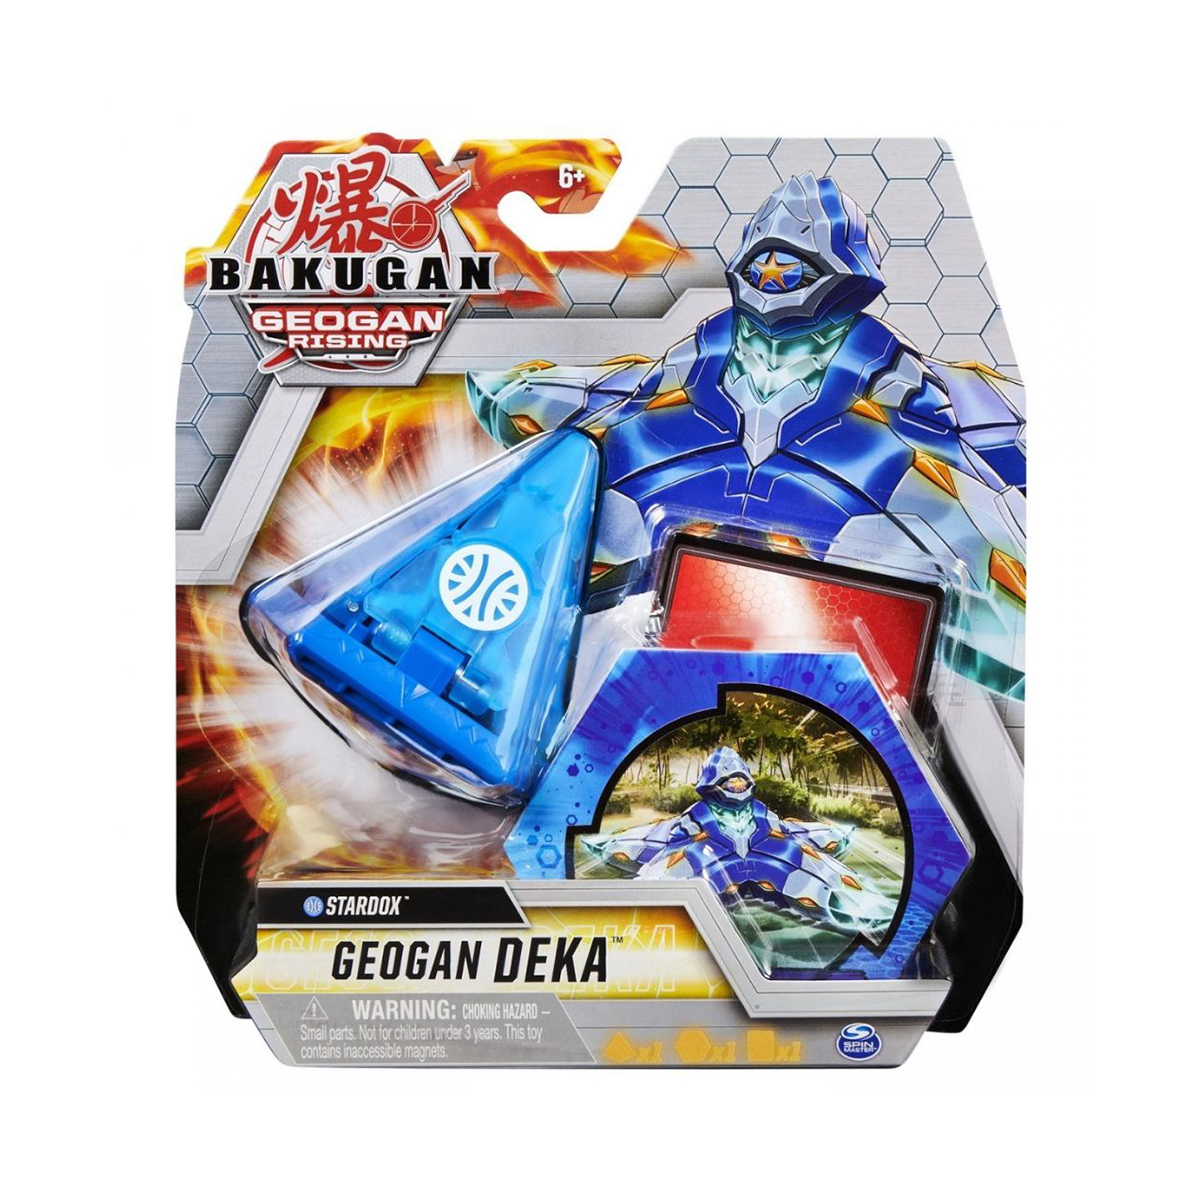 Figurina Bakugan, Geogan Deka, S3, 20129213